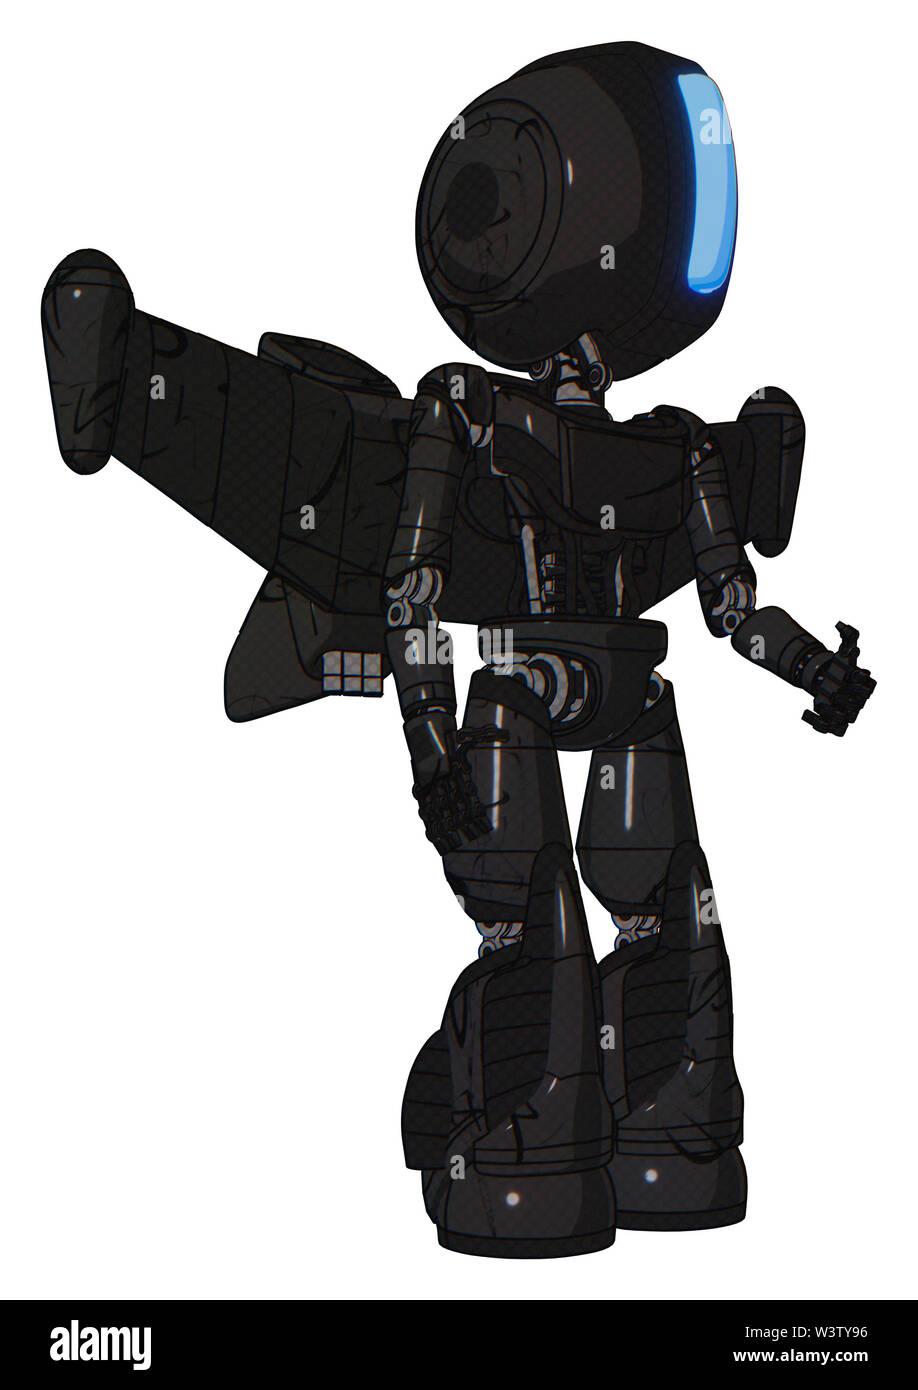 Cyborg containing elements: round head, large vertical visor, light chest exoshielding, ultralight chest exosuit, stellar jet wing rocket pack, light - Stock Image